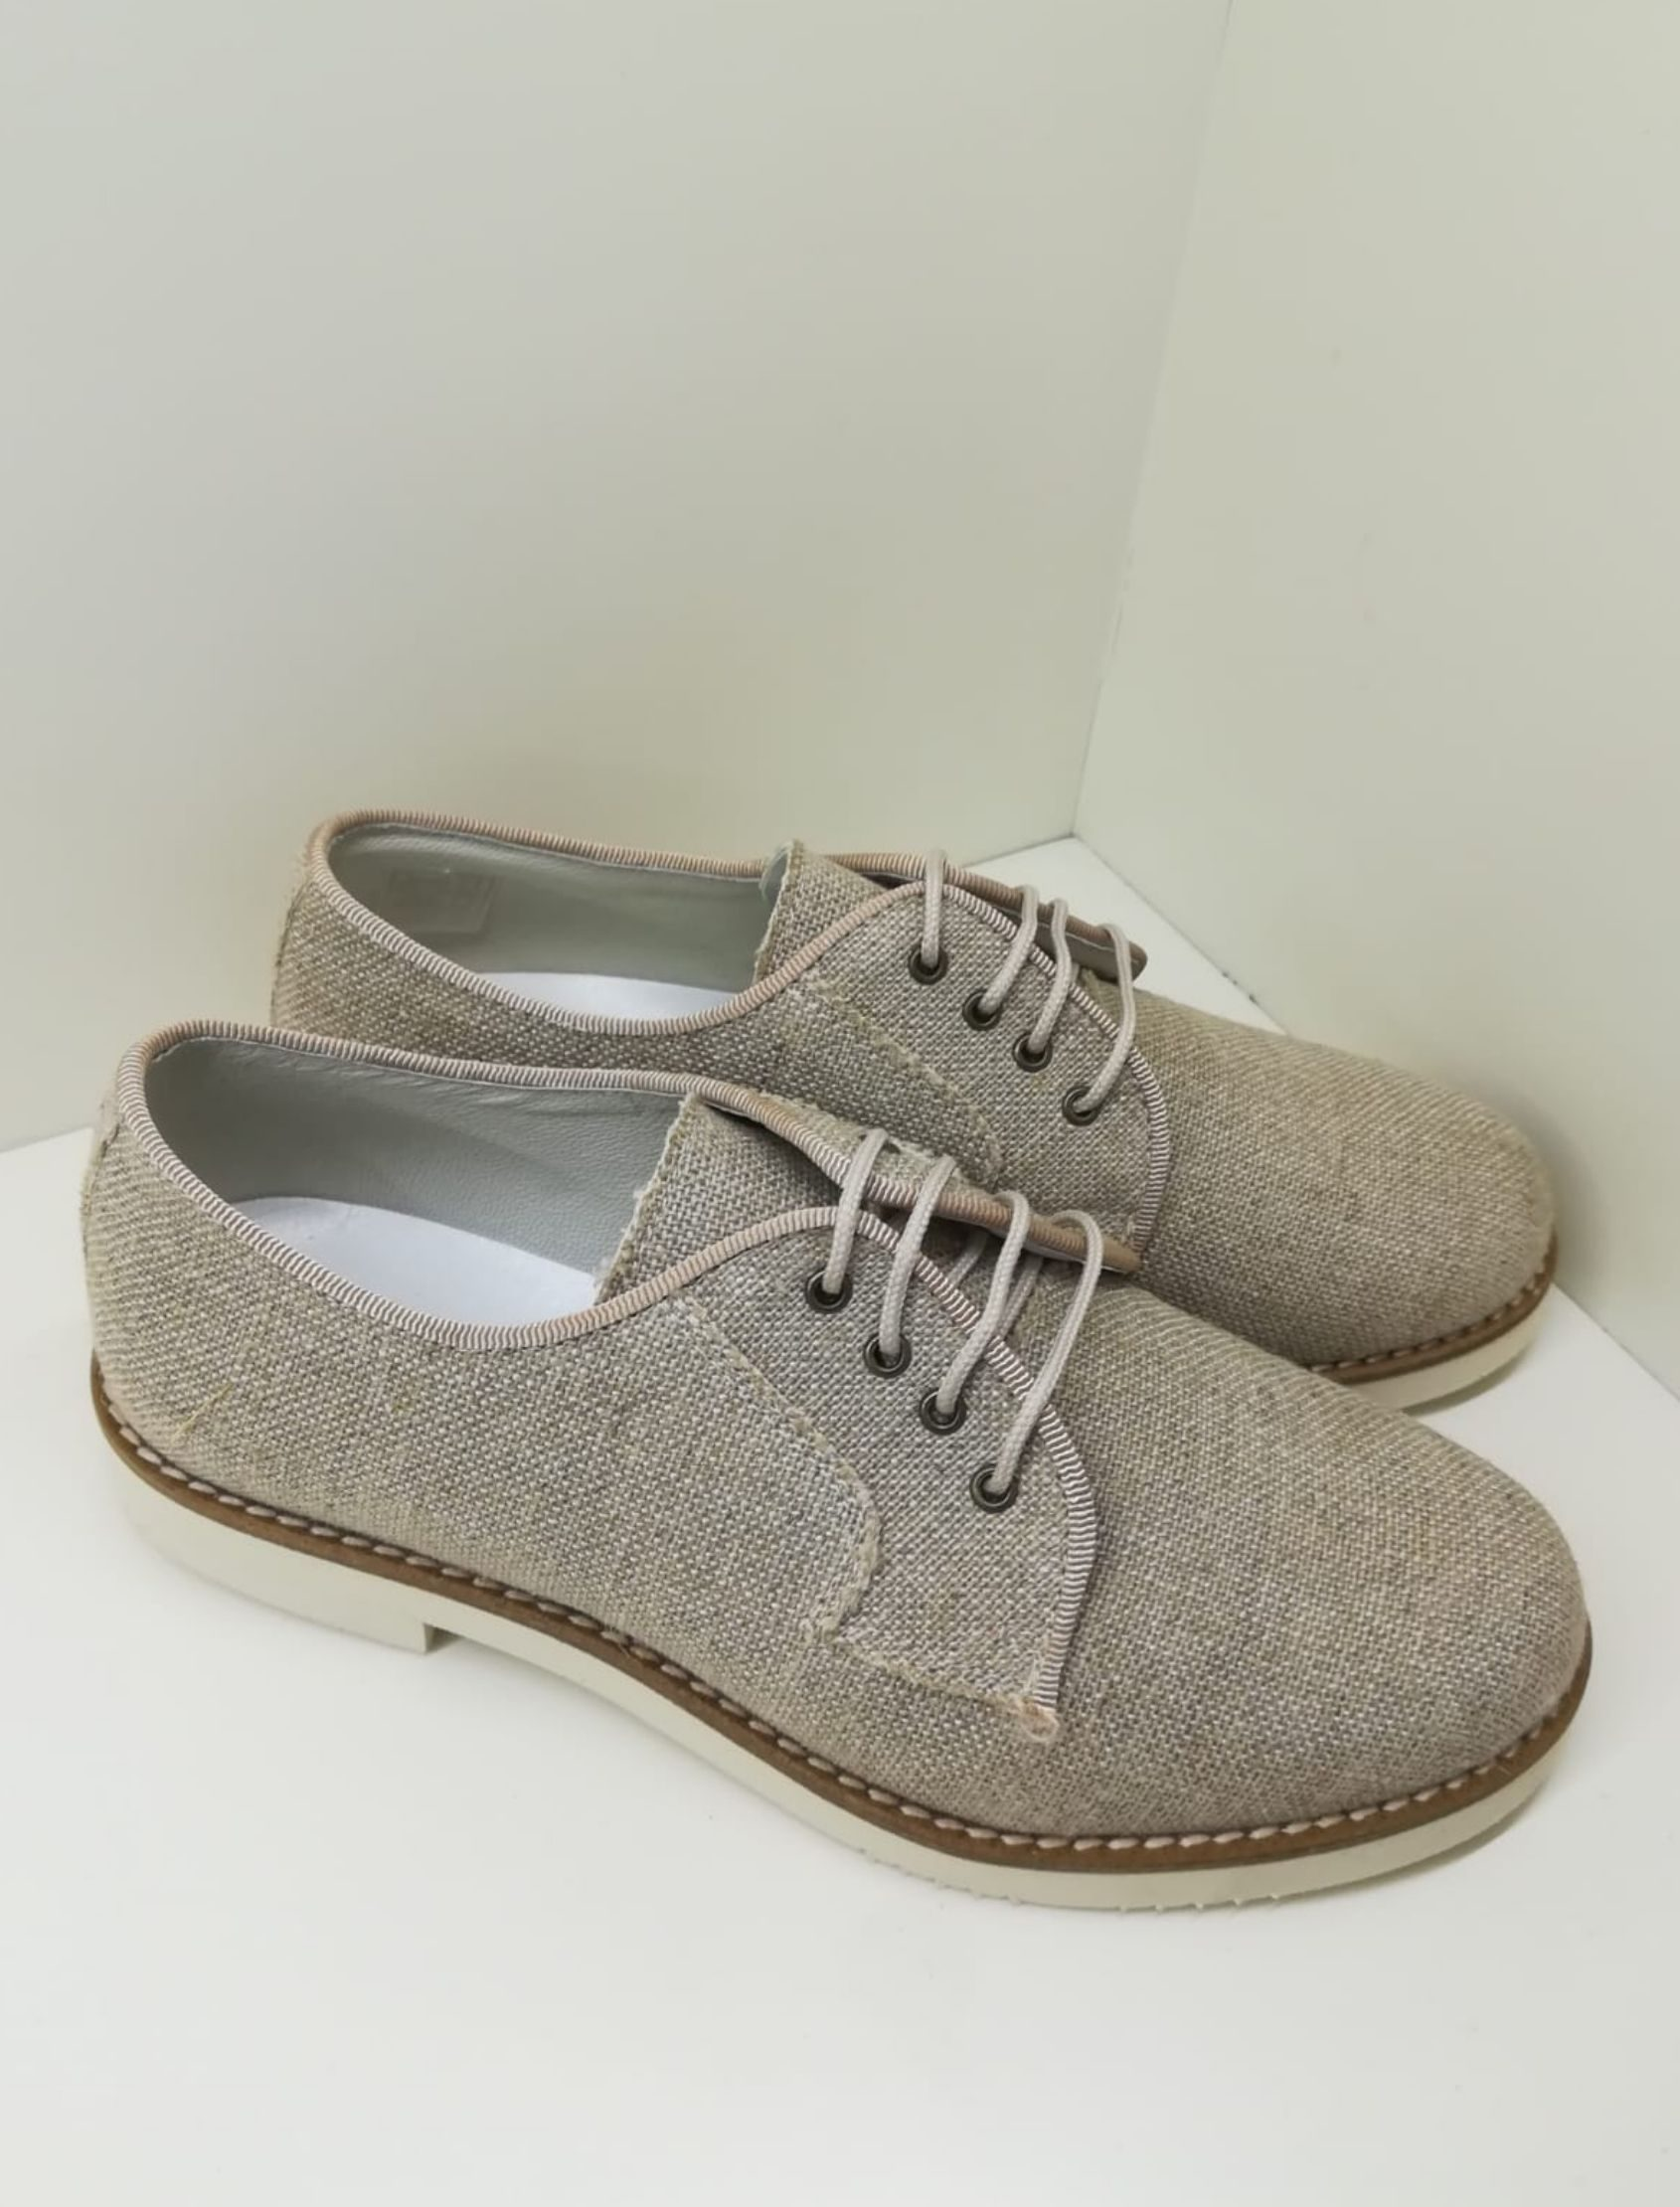 Zapato estilo blucher con cordones en lino taupe